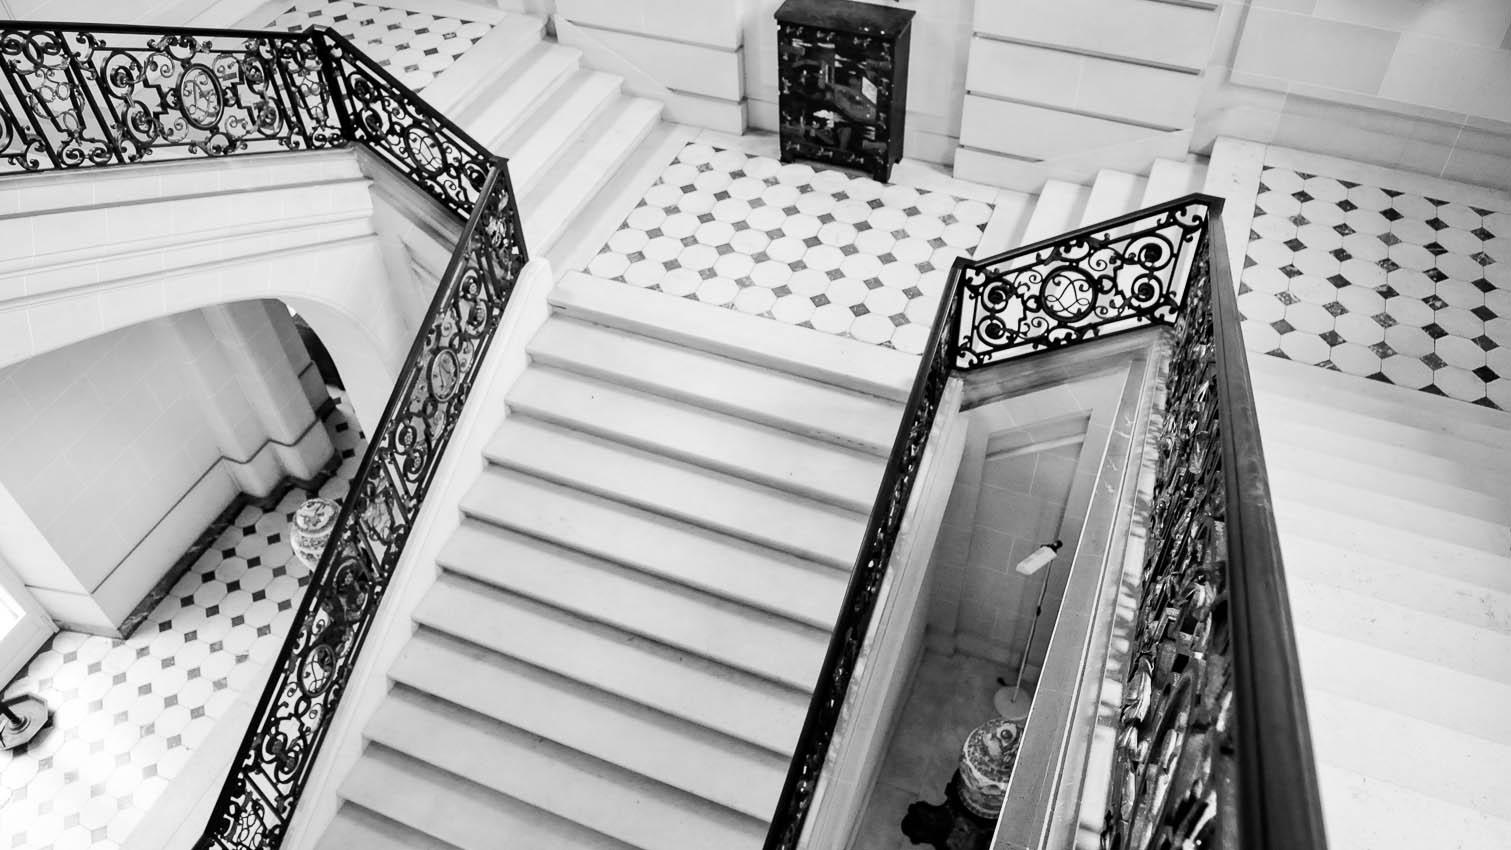 21-chateau-castel-location-vente-decors-film-cinema-photo-belgium-bruxelles